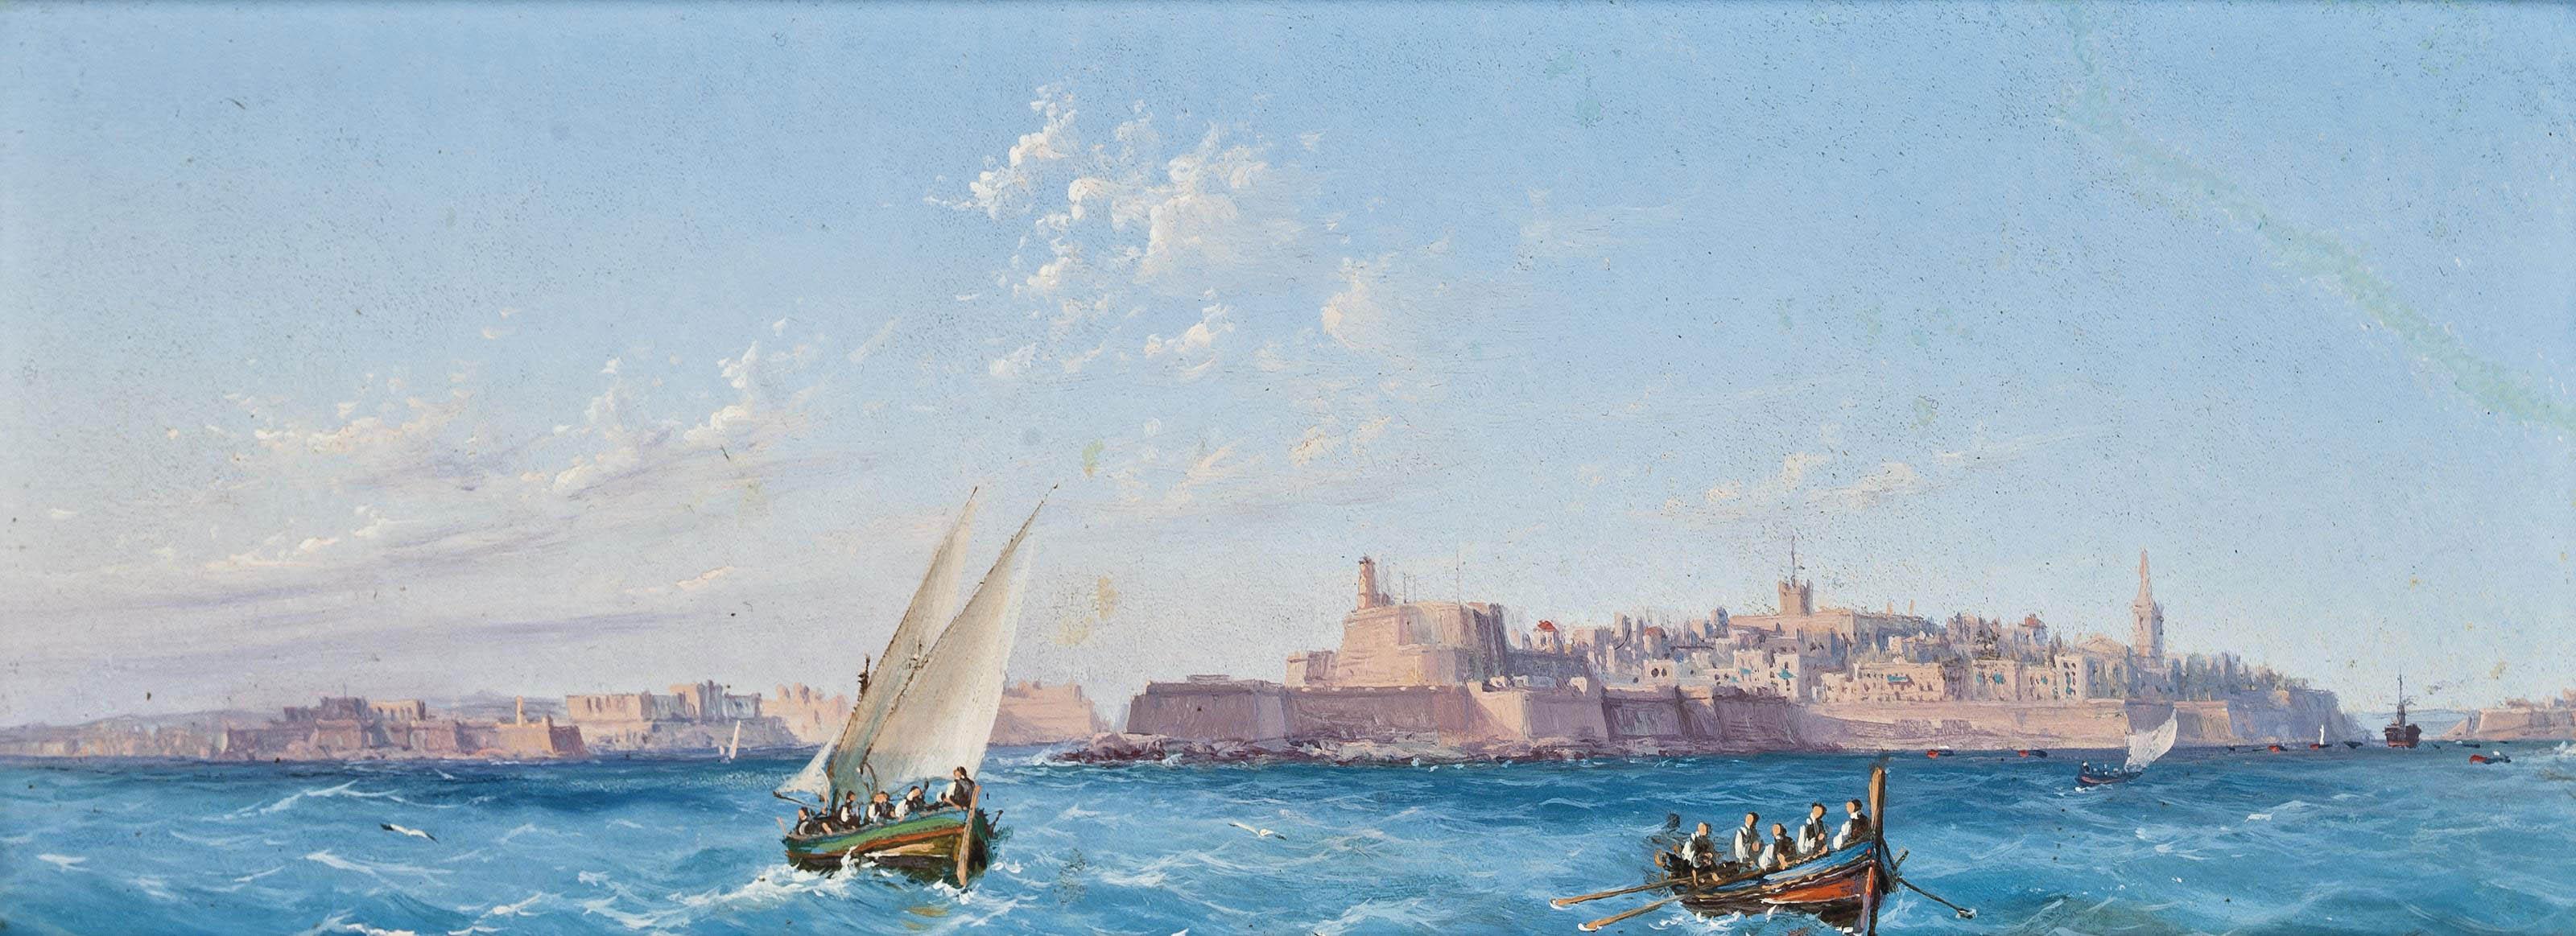 Luigi Maria Galea (Maltese, 1847-1917)